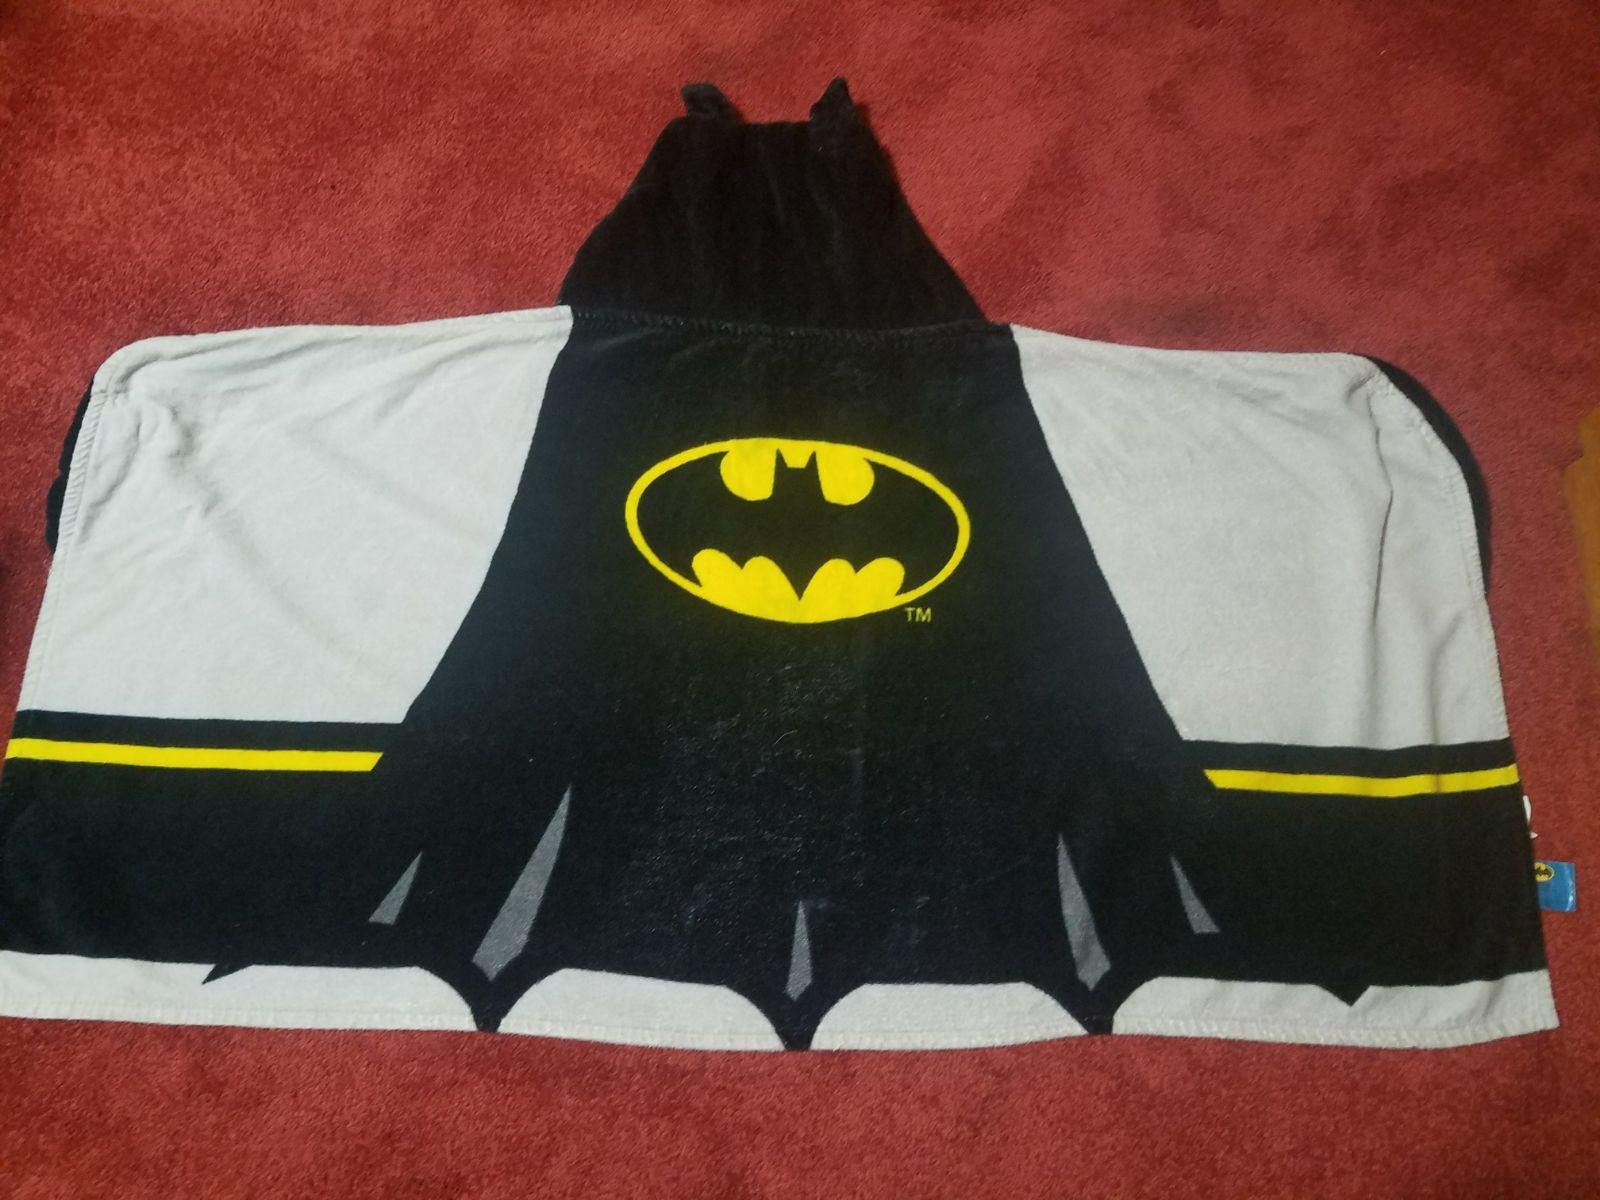 2 Batman hooded towels